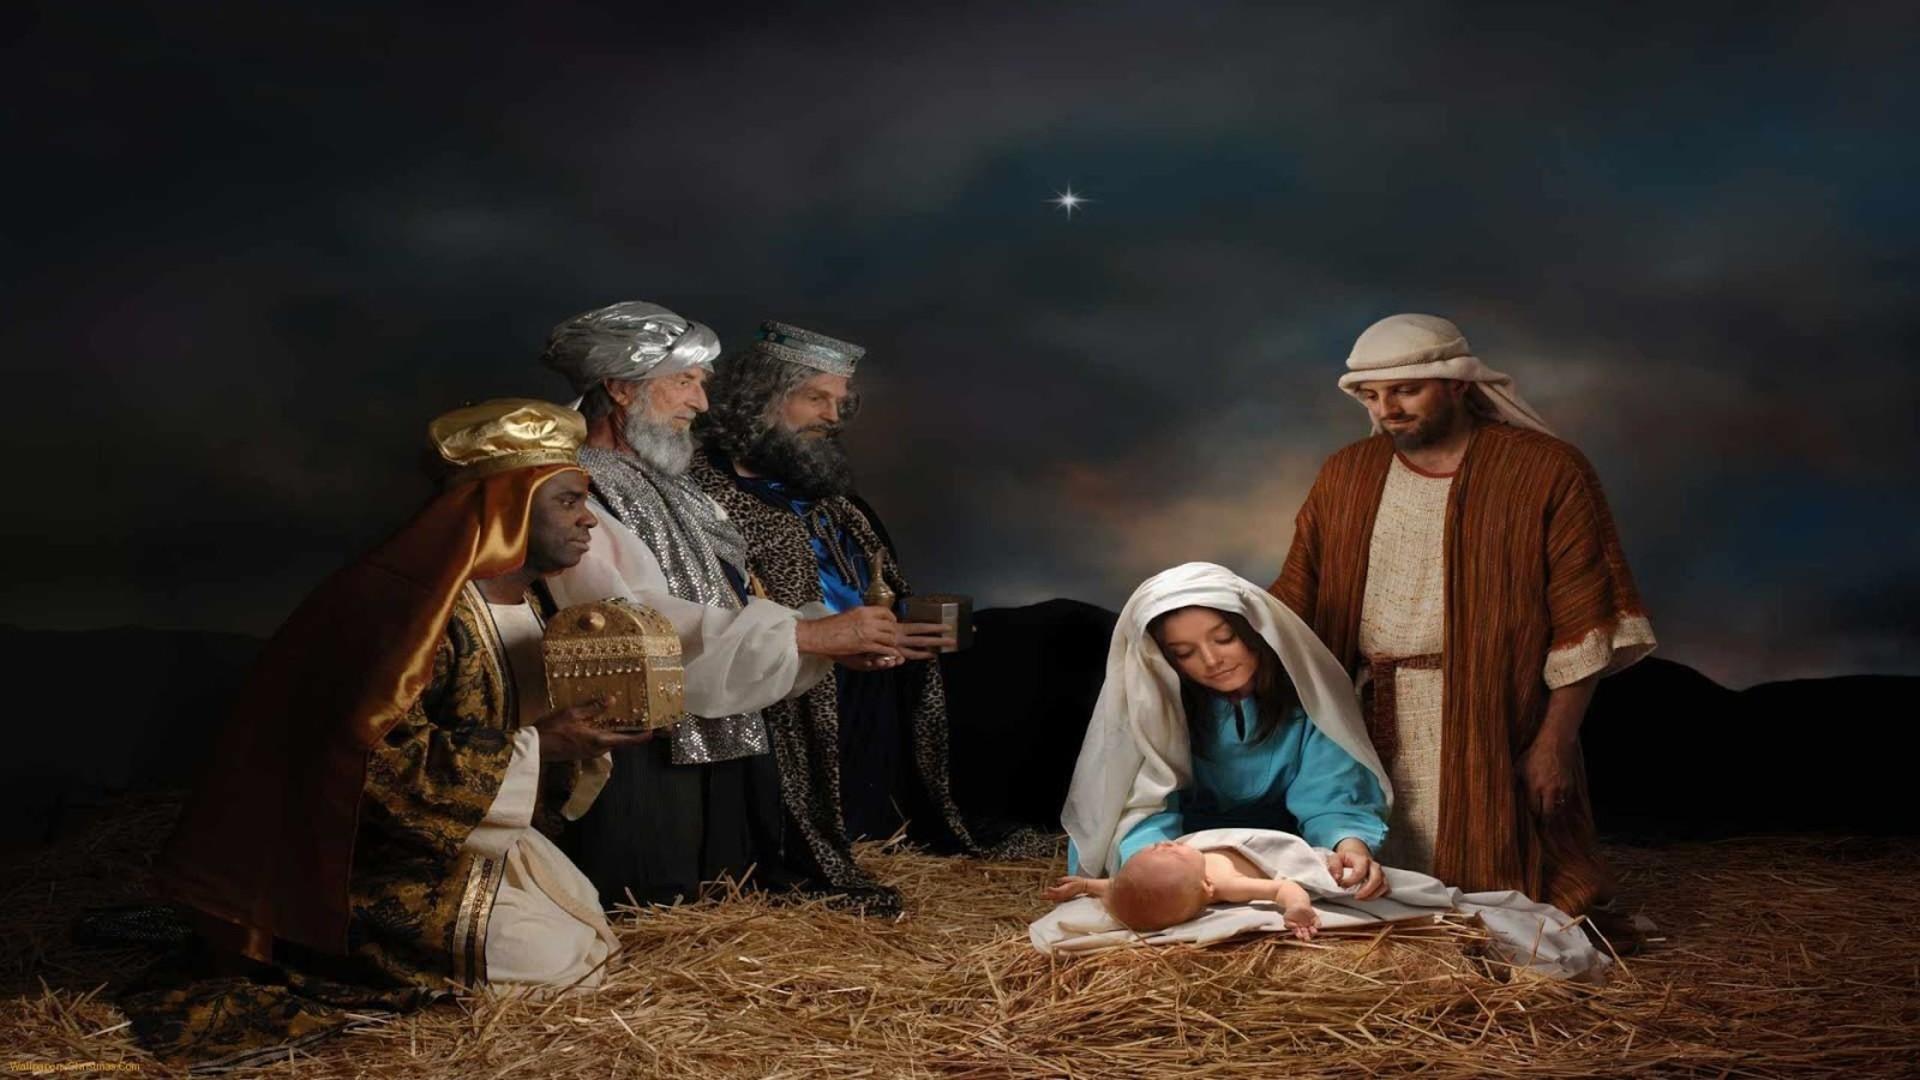 Nativity Scene Background ·①